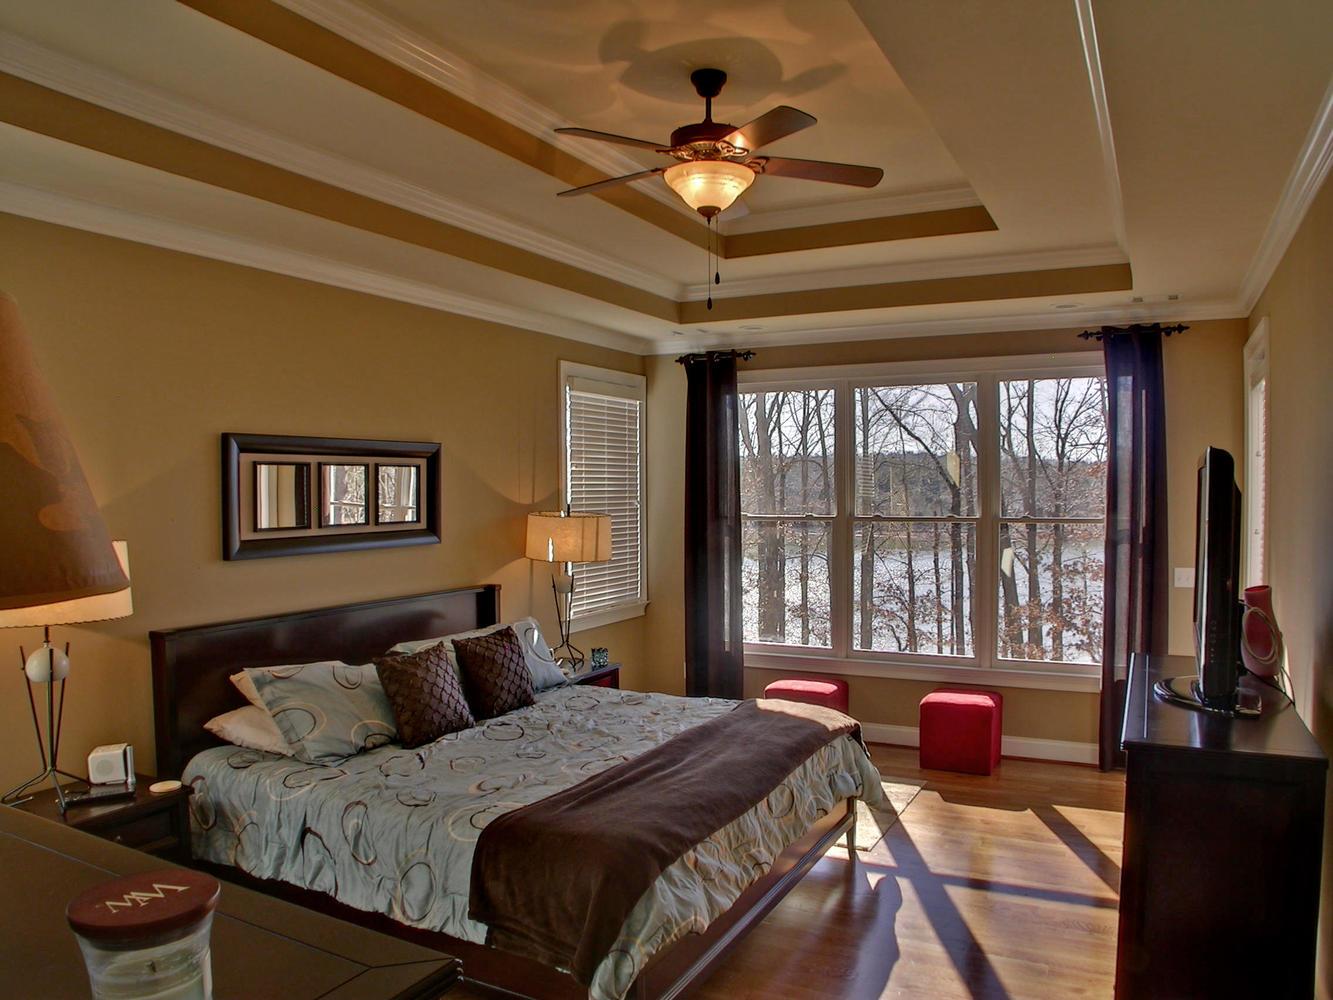 Portfolio 3 Hartwell GA 30643-large-010-10-Master Bedroom-1333x1000-72dpi